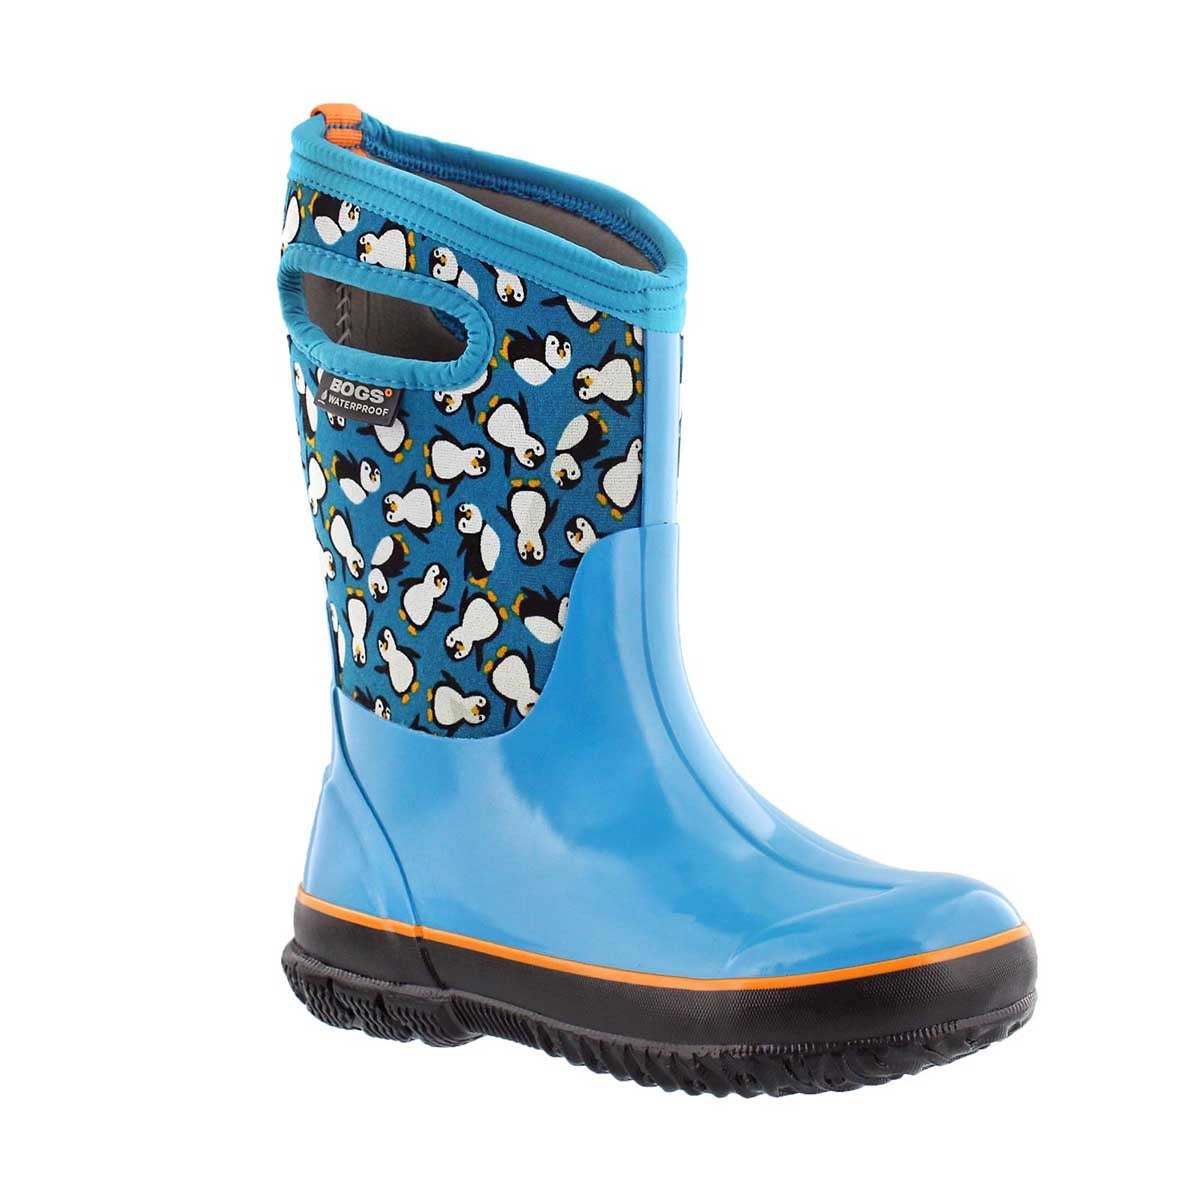 Girls' CLASSIC PENGUINS trq mlti waterproof boots